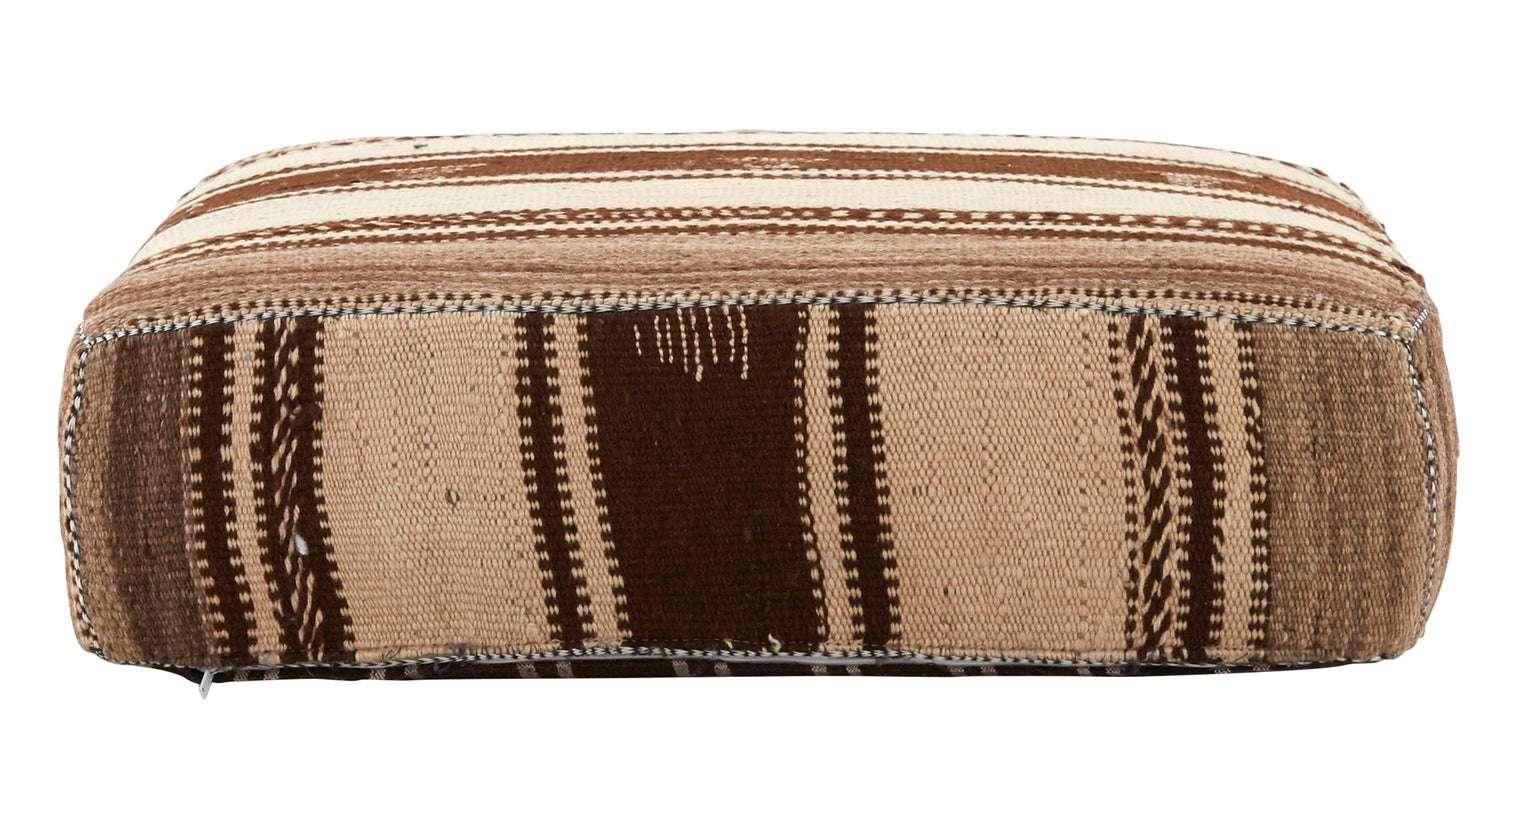 Kilim floor pillow in brown